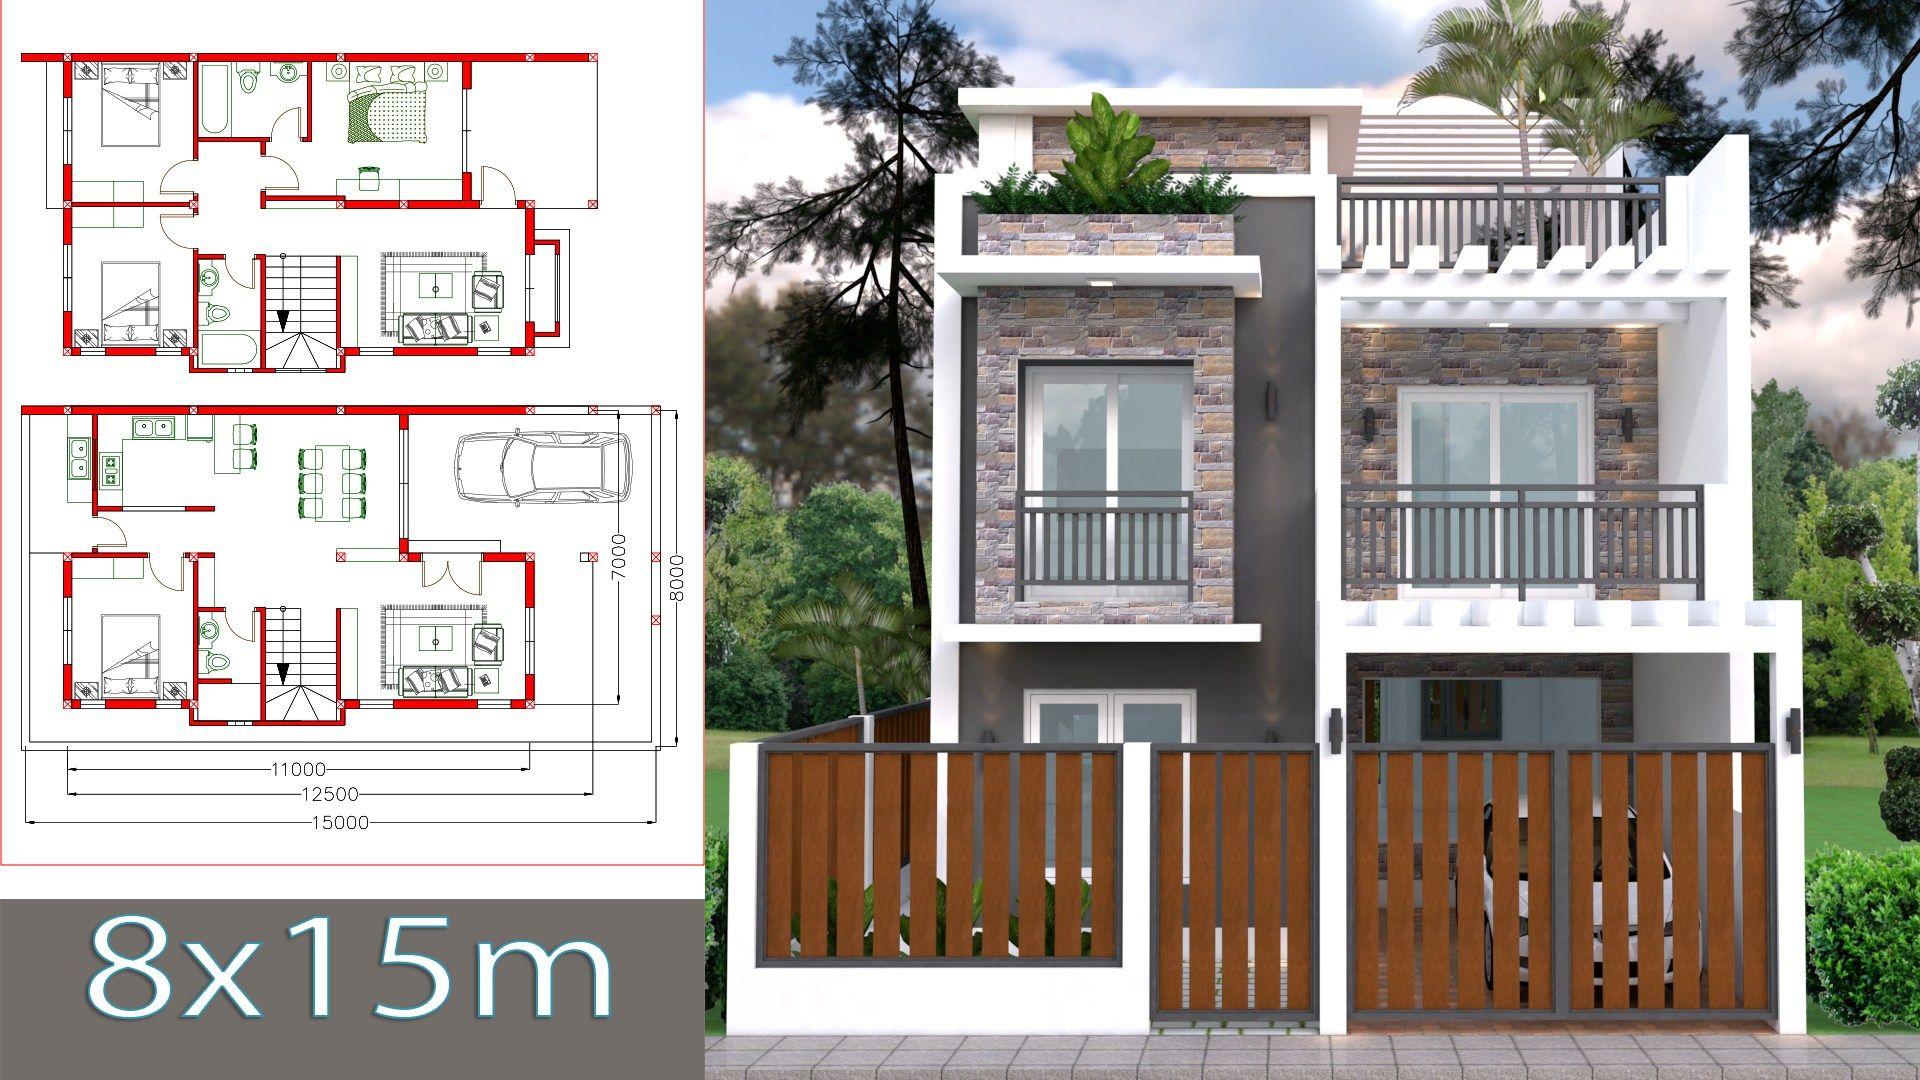 Home Design Plan 7x11m Plot 8x15 With 4 Bedrooms Planos De Casas